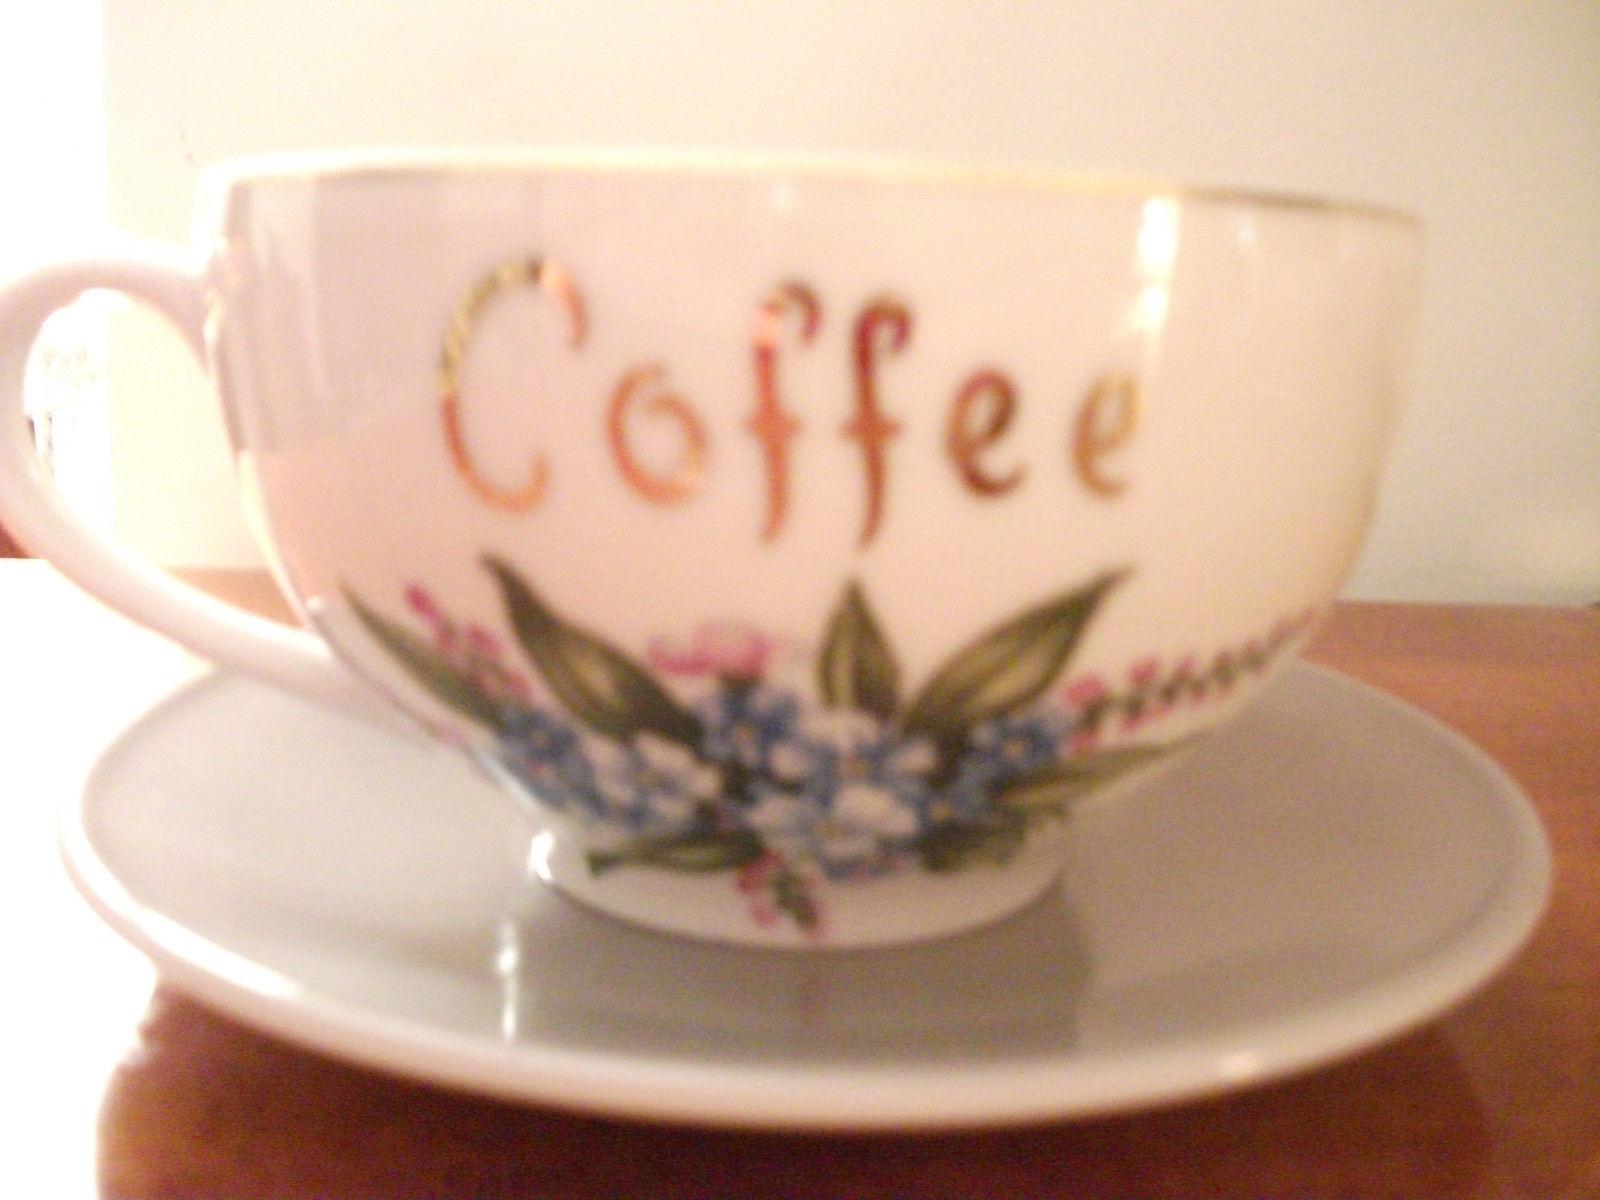 Dad Extra Large Teacup Tea Cup And Saucer Coffee Mug New